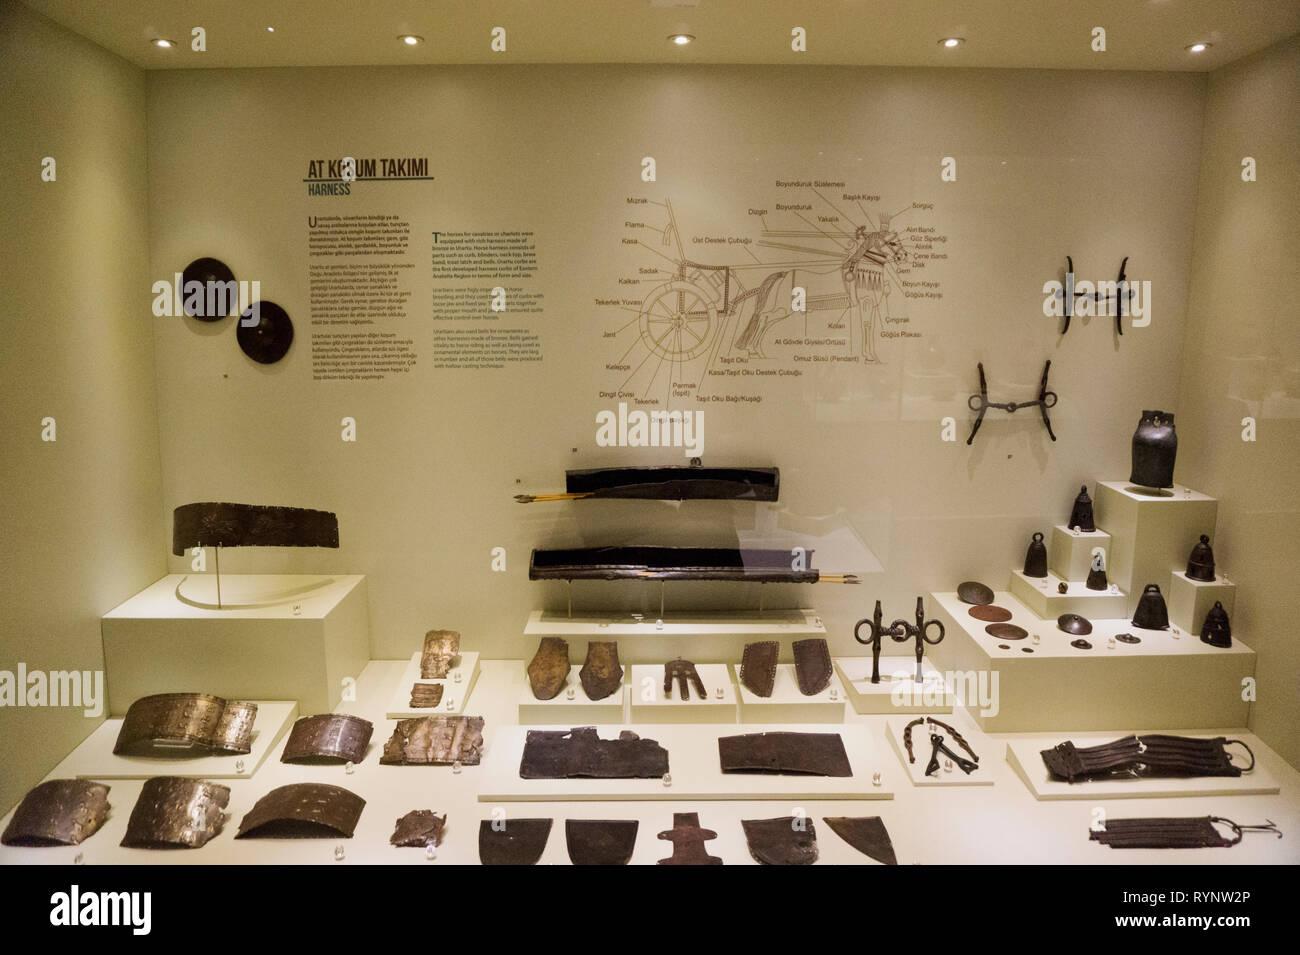 Harness by Urartu Period, Gaziantep Museum Turkey - Stock Image